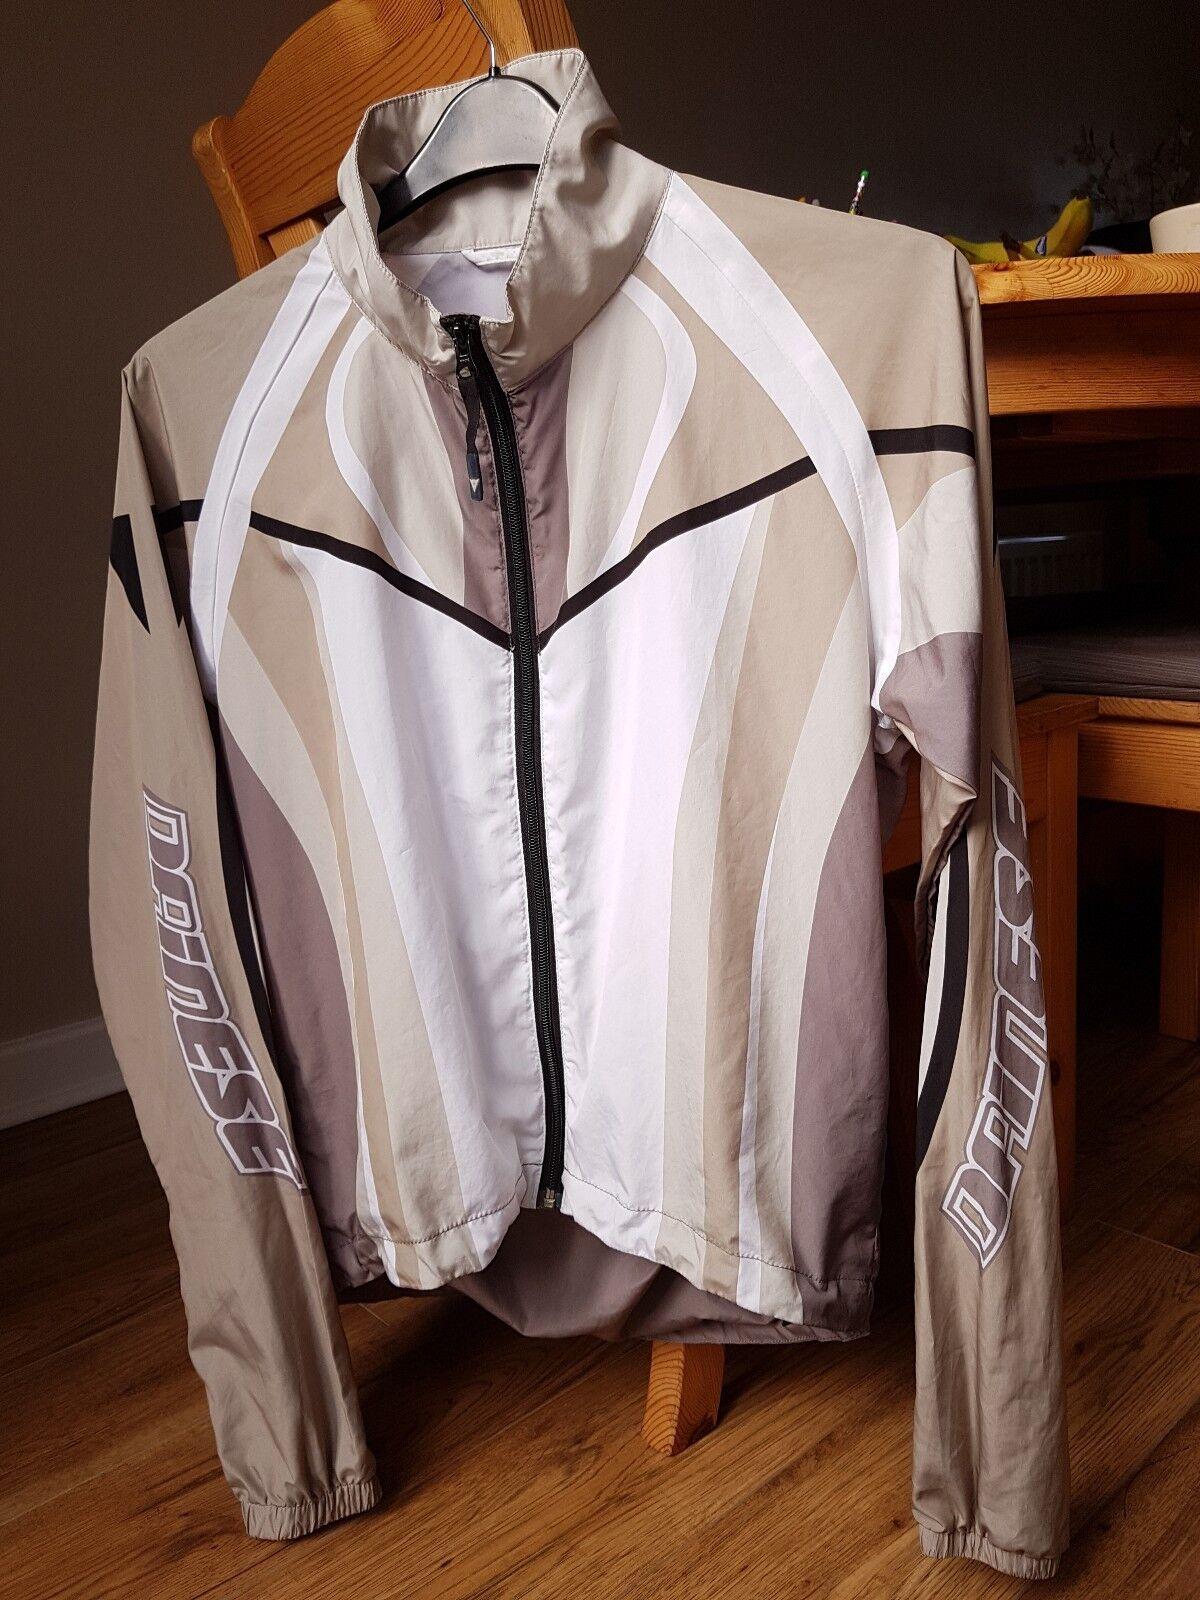 Dainese Ultra Leggero (185g) Uomo Ciclismo Giacca a Vento. S S S f61d83